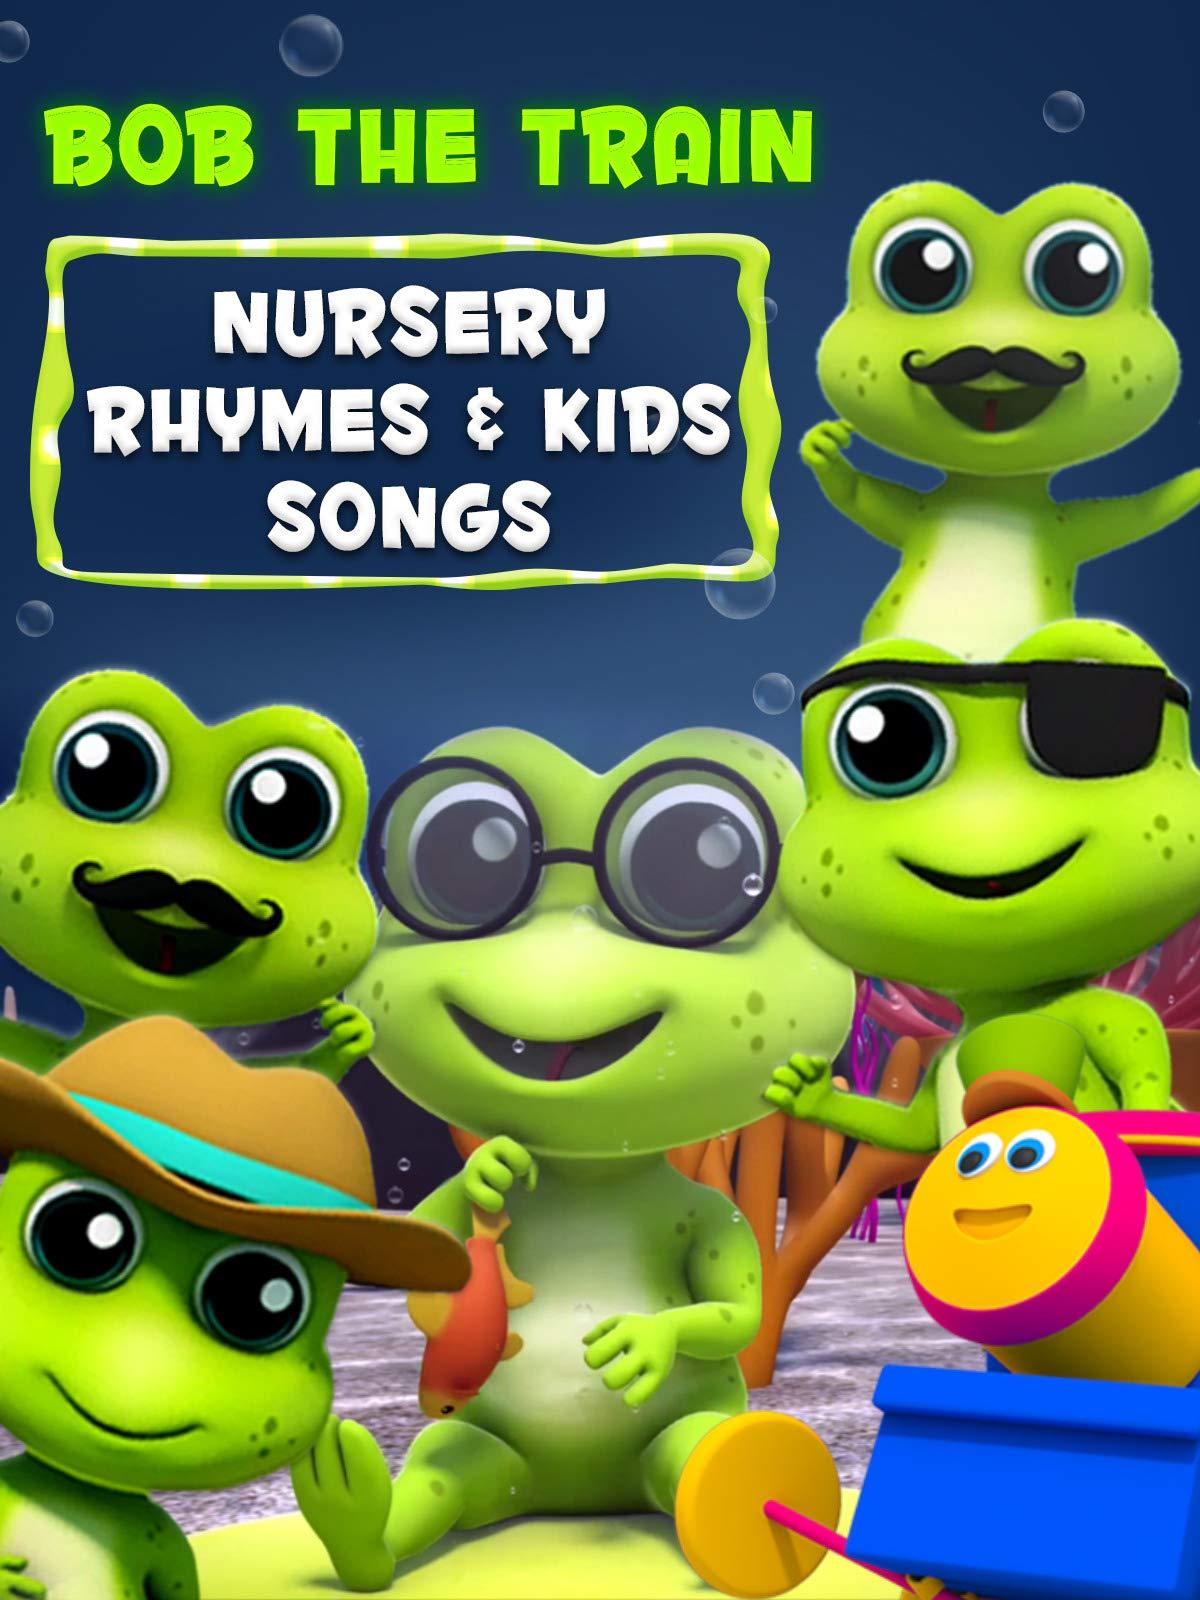 Nursery Rhymes & Kids Songs - Bob The Train